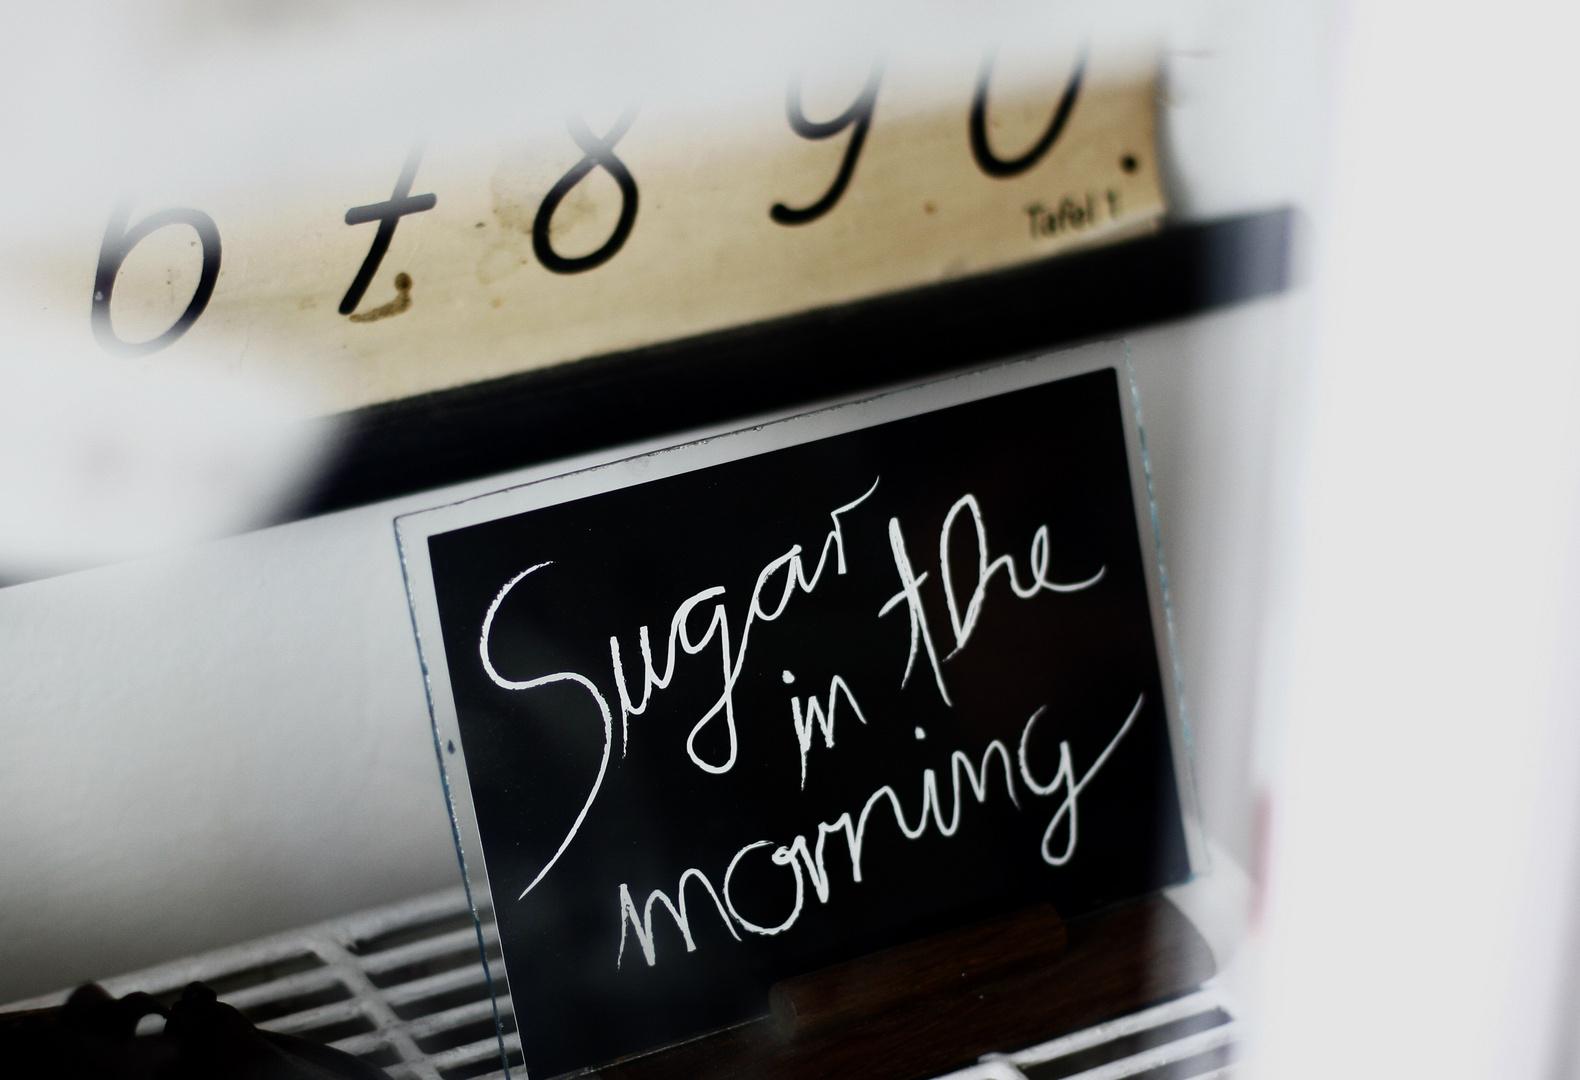 Sugar in the morning!